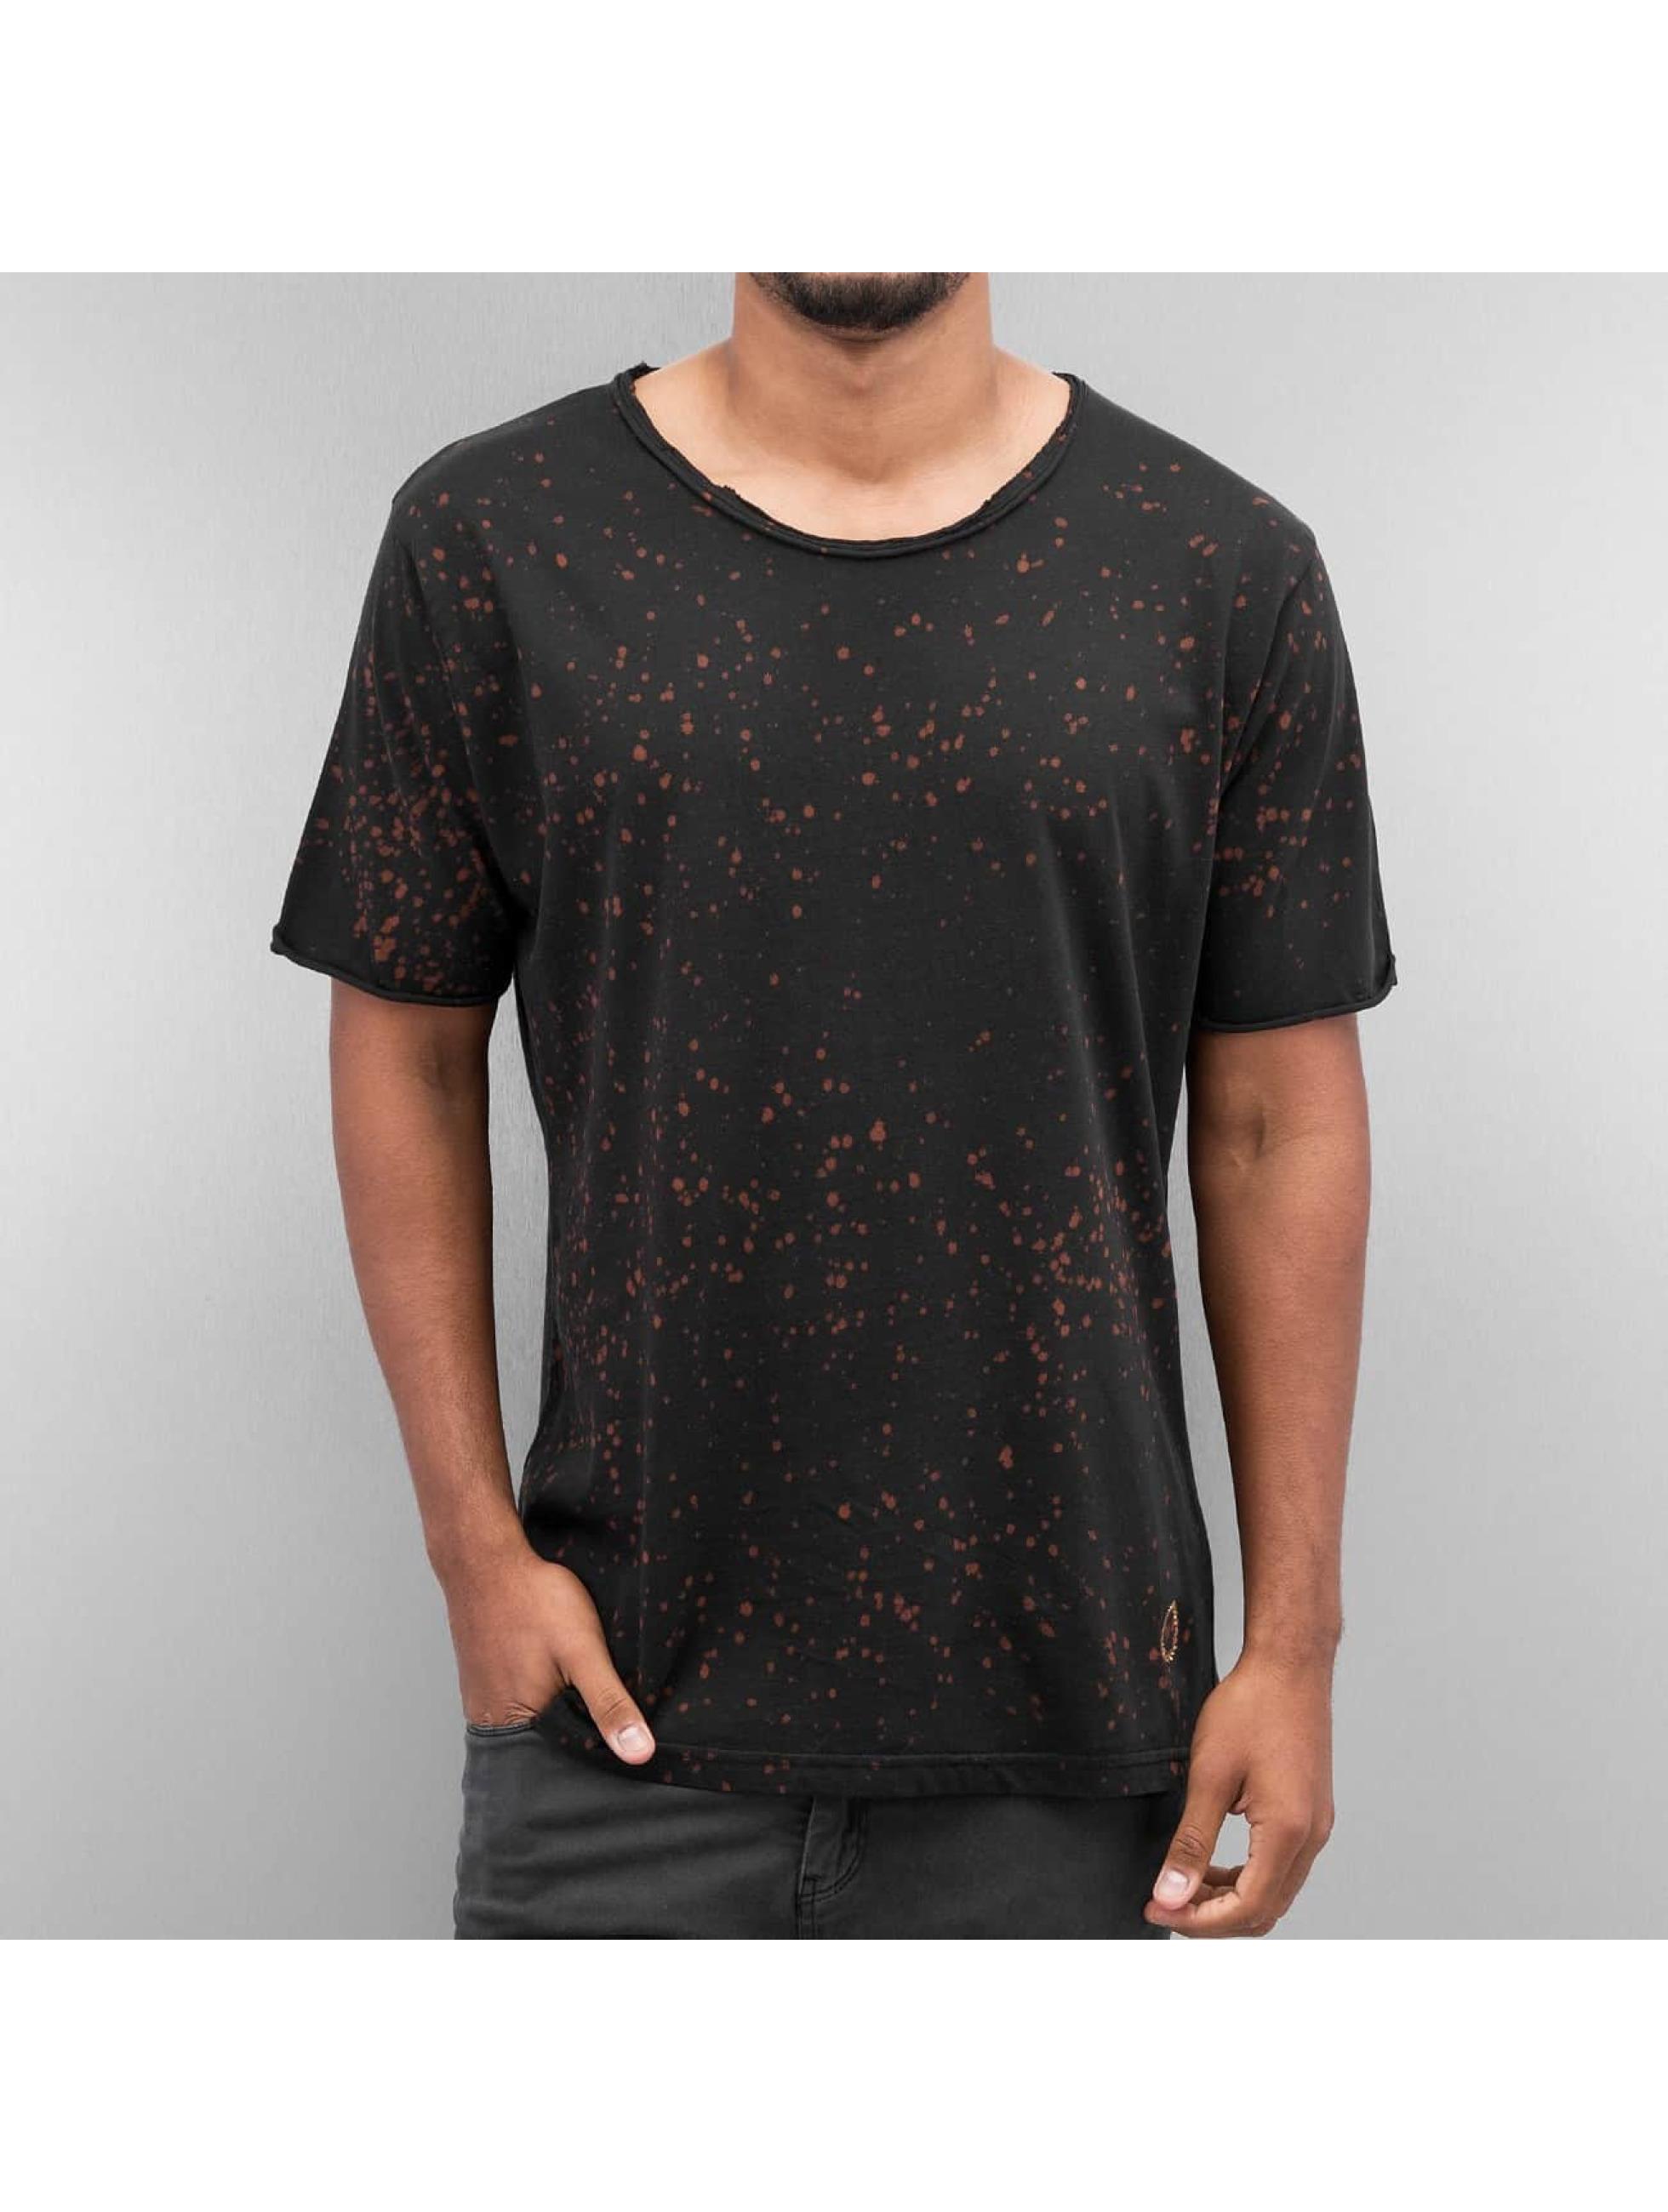 Yezz Männer T-Shirt Dots in schwarz